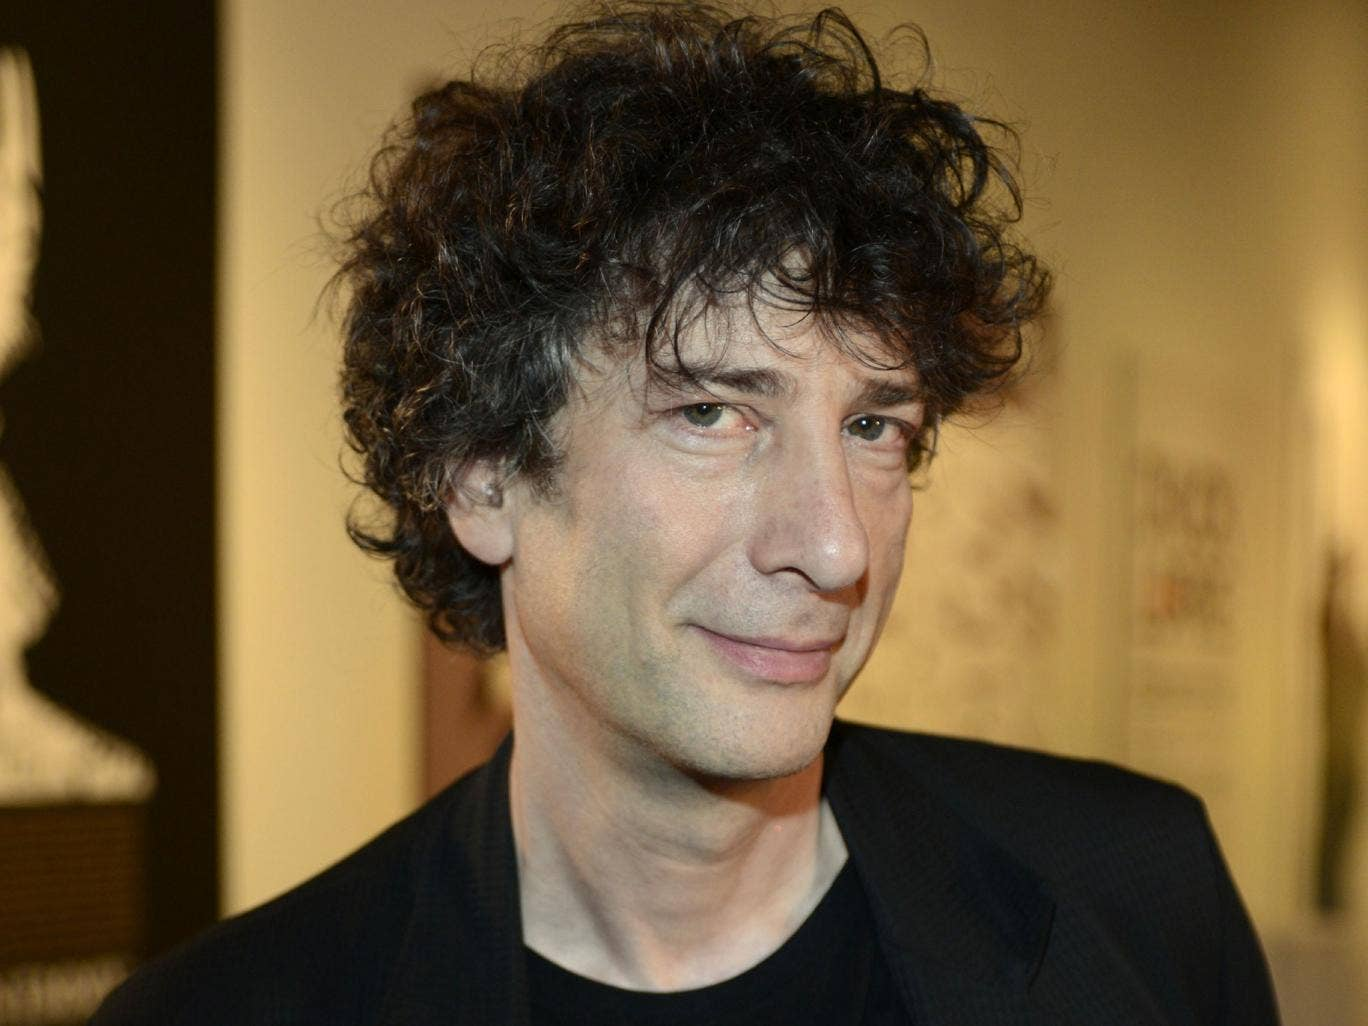 Neil Gaiman's fantasy comes into its own on radio